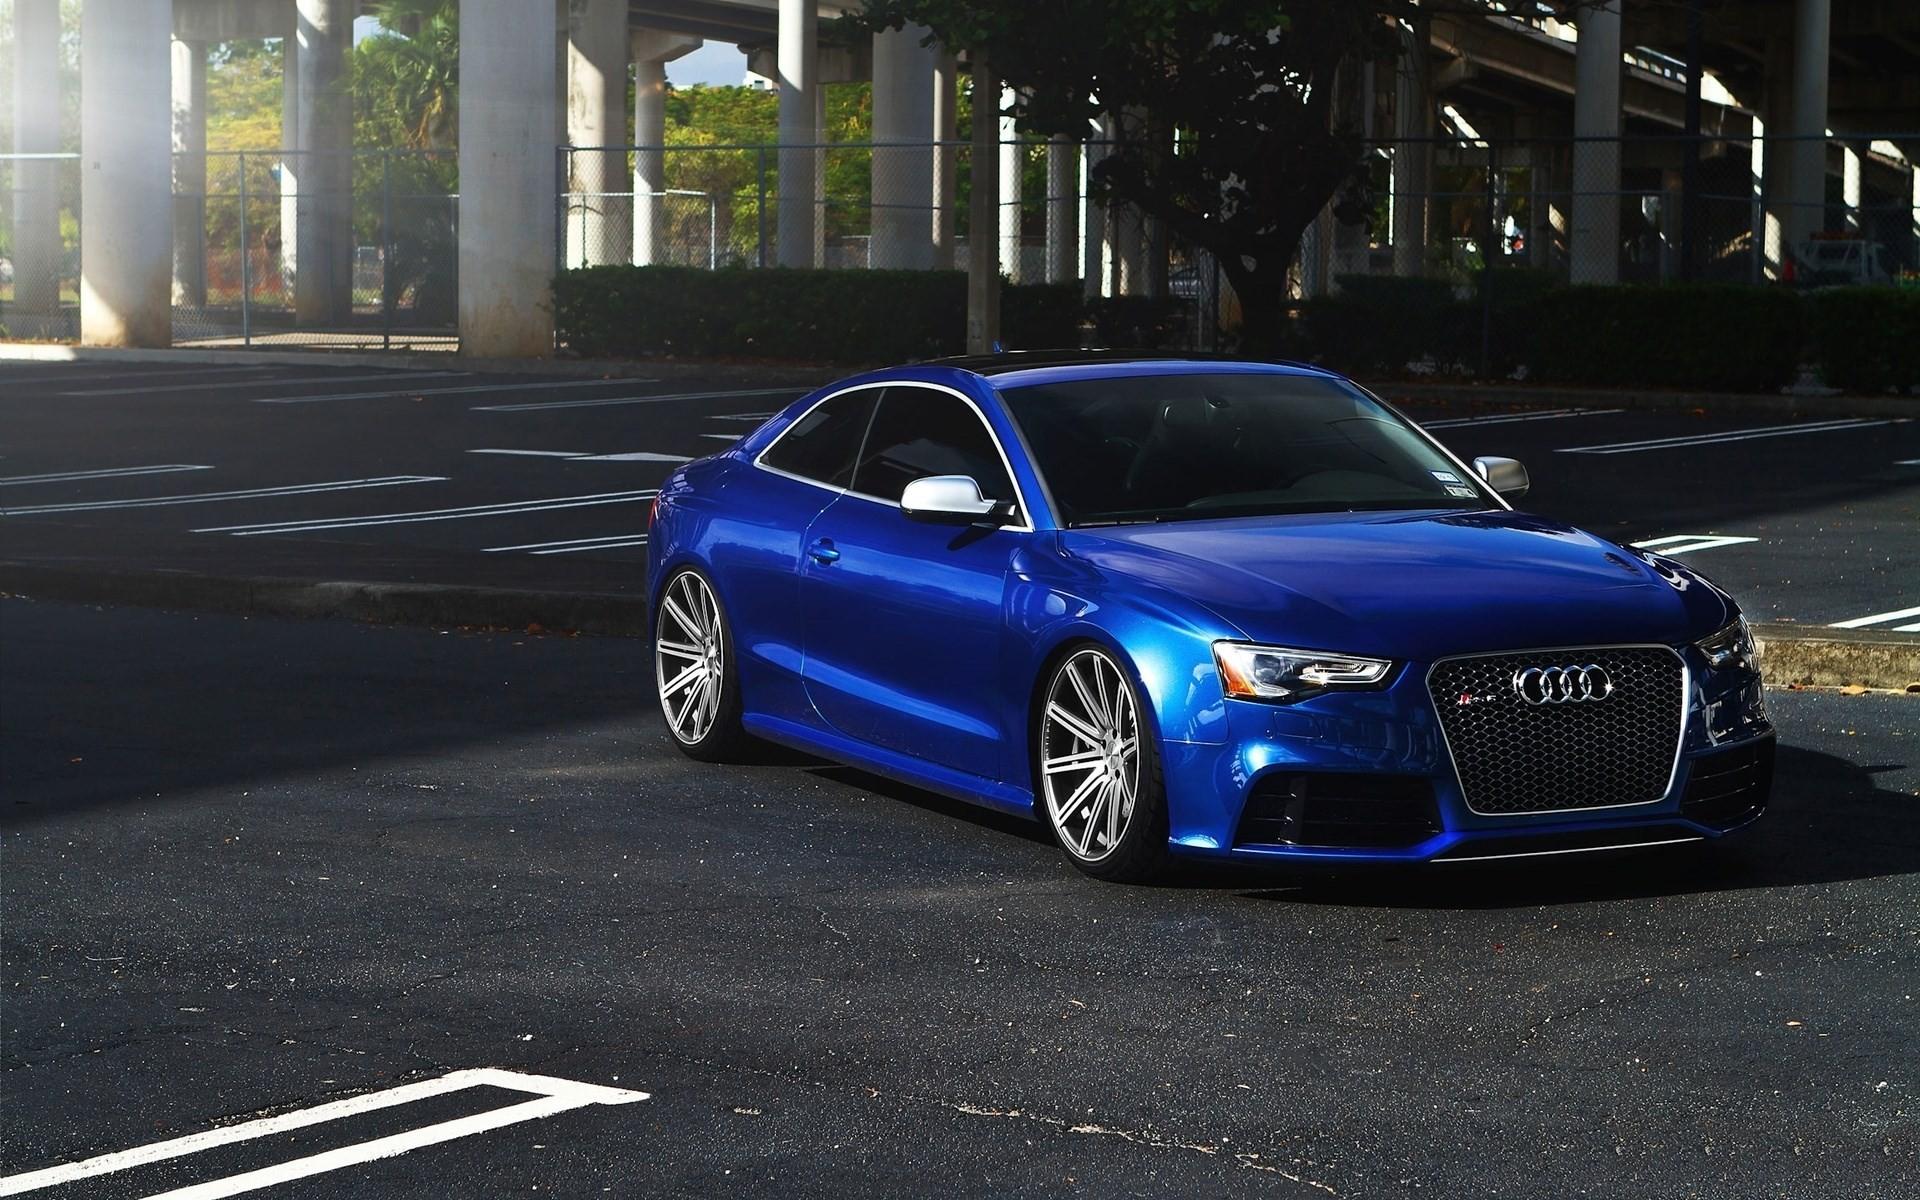 Audi Blue Audi Rs5 Rims Stance Car Vehicle Blue Cars Urban Wallpaper Resolution 1920x1200 Id 5650 Wallha Com